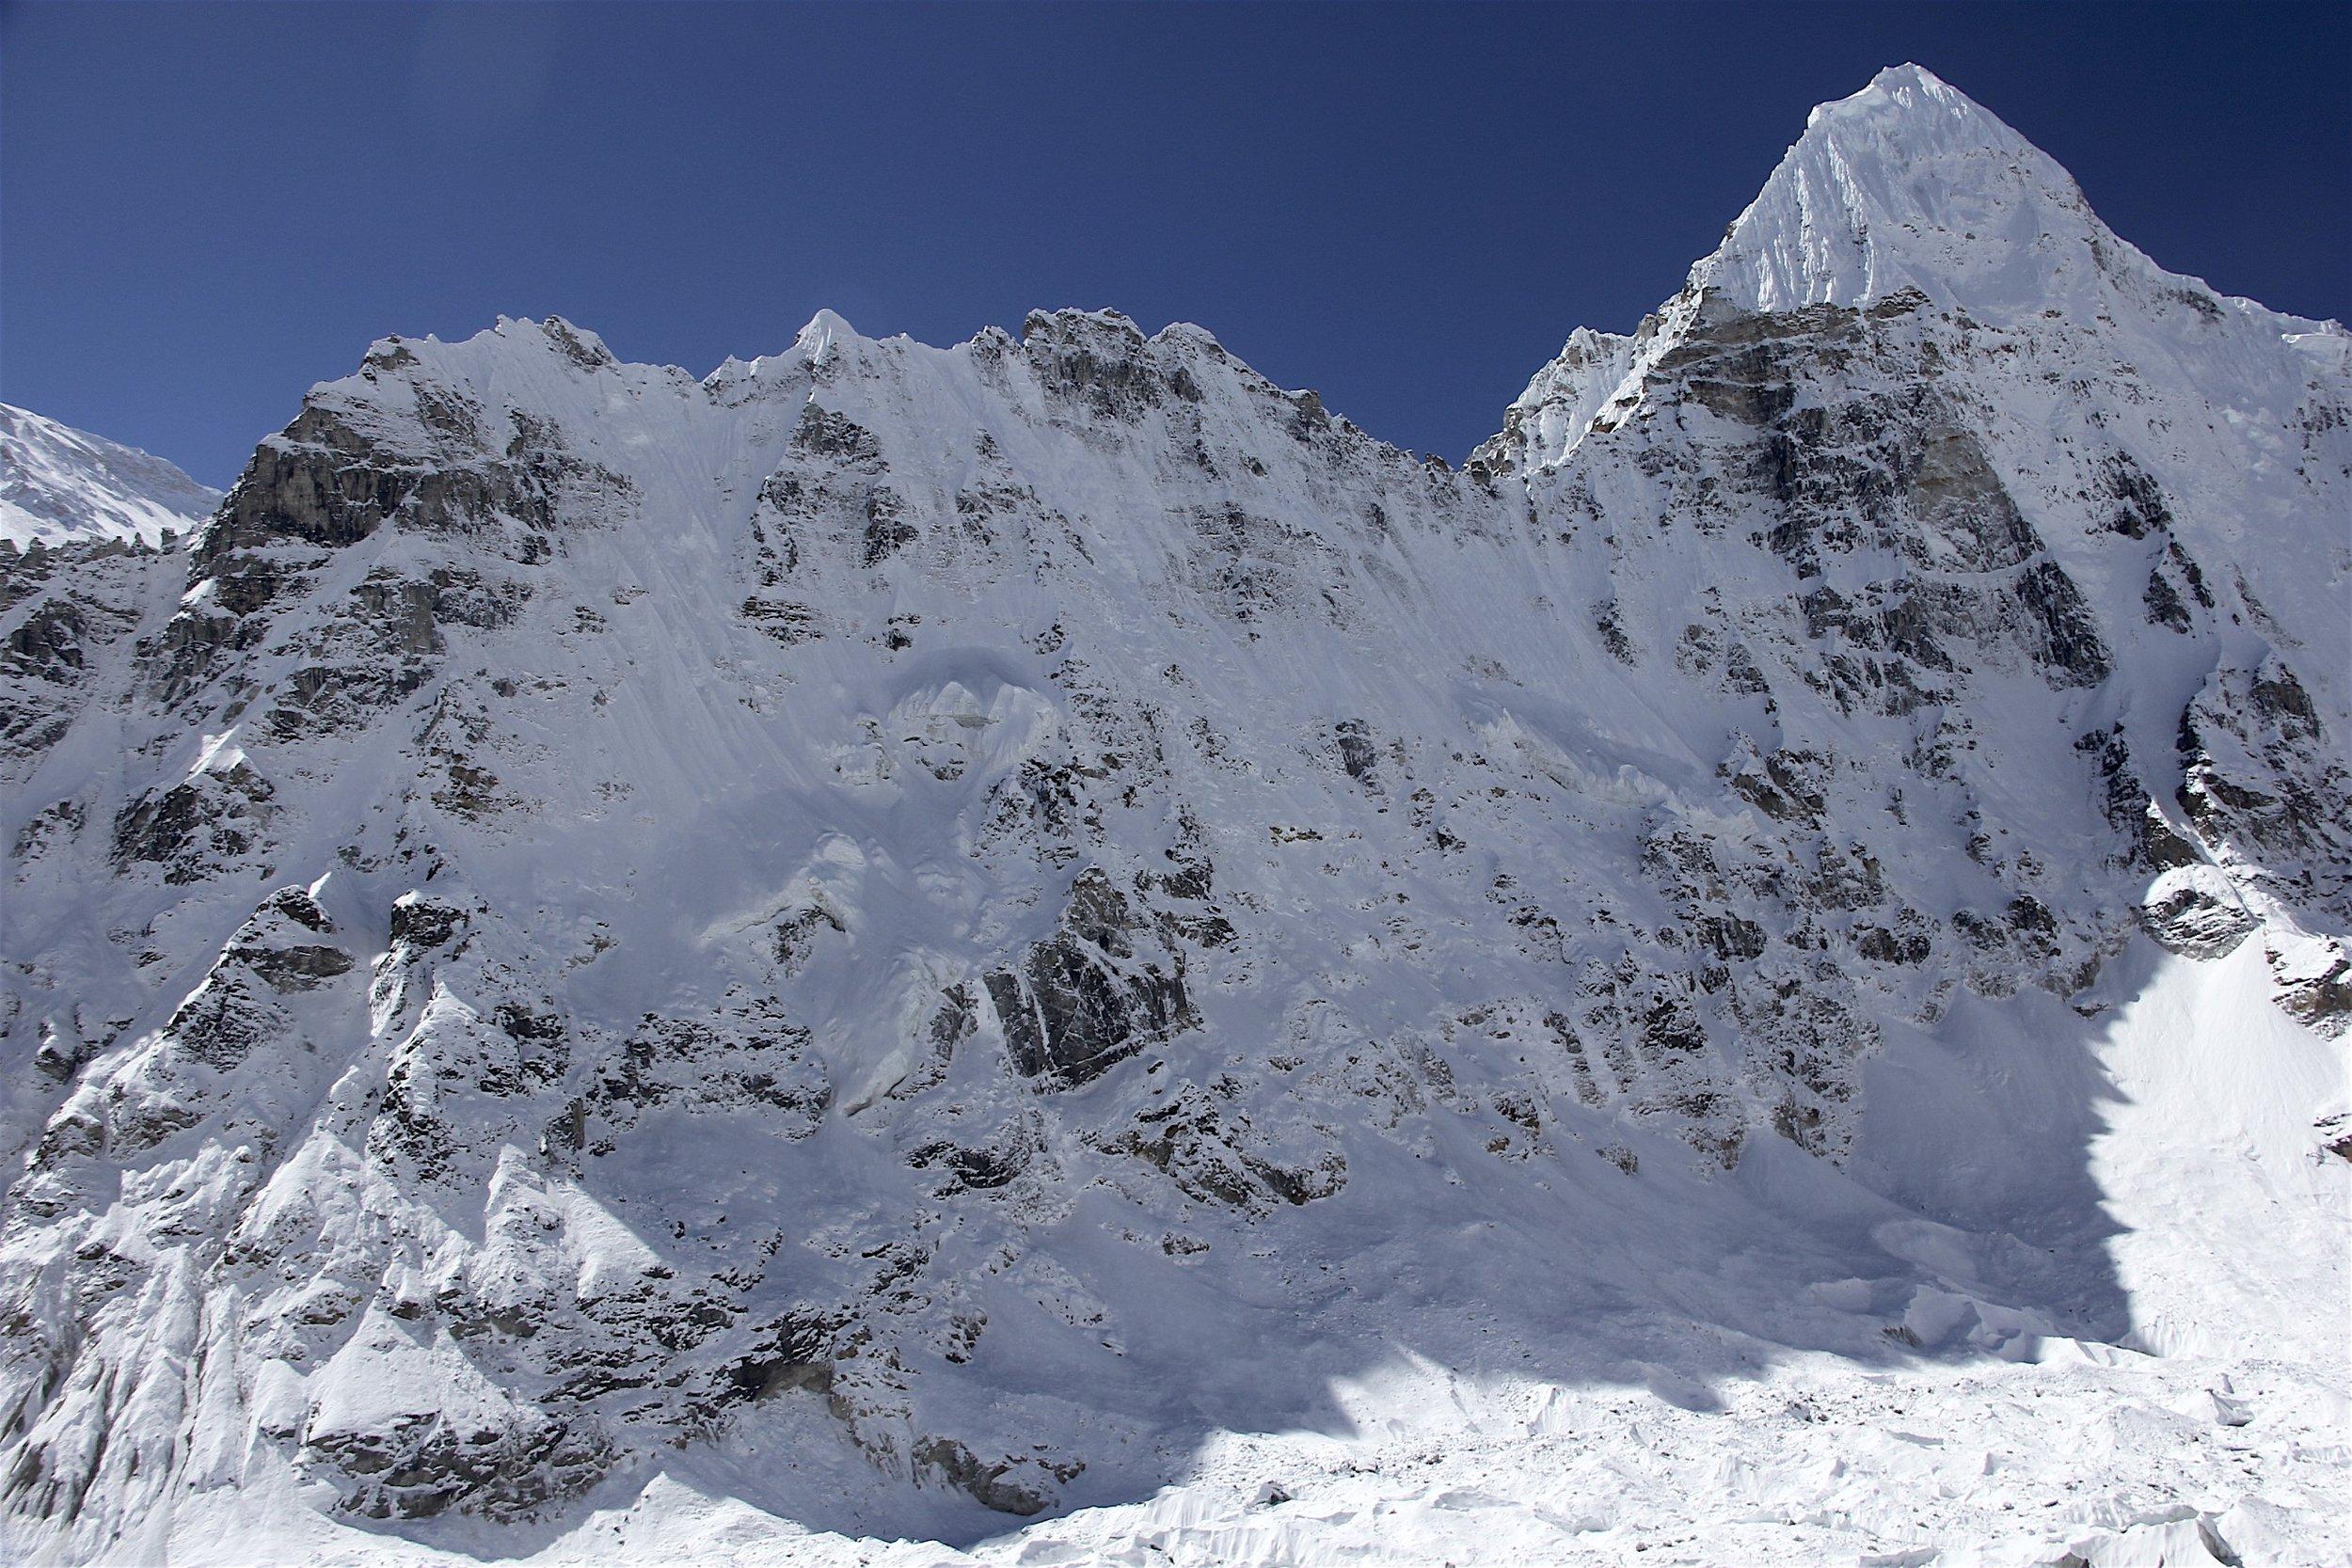 Wedge Peak 6,802m